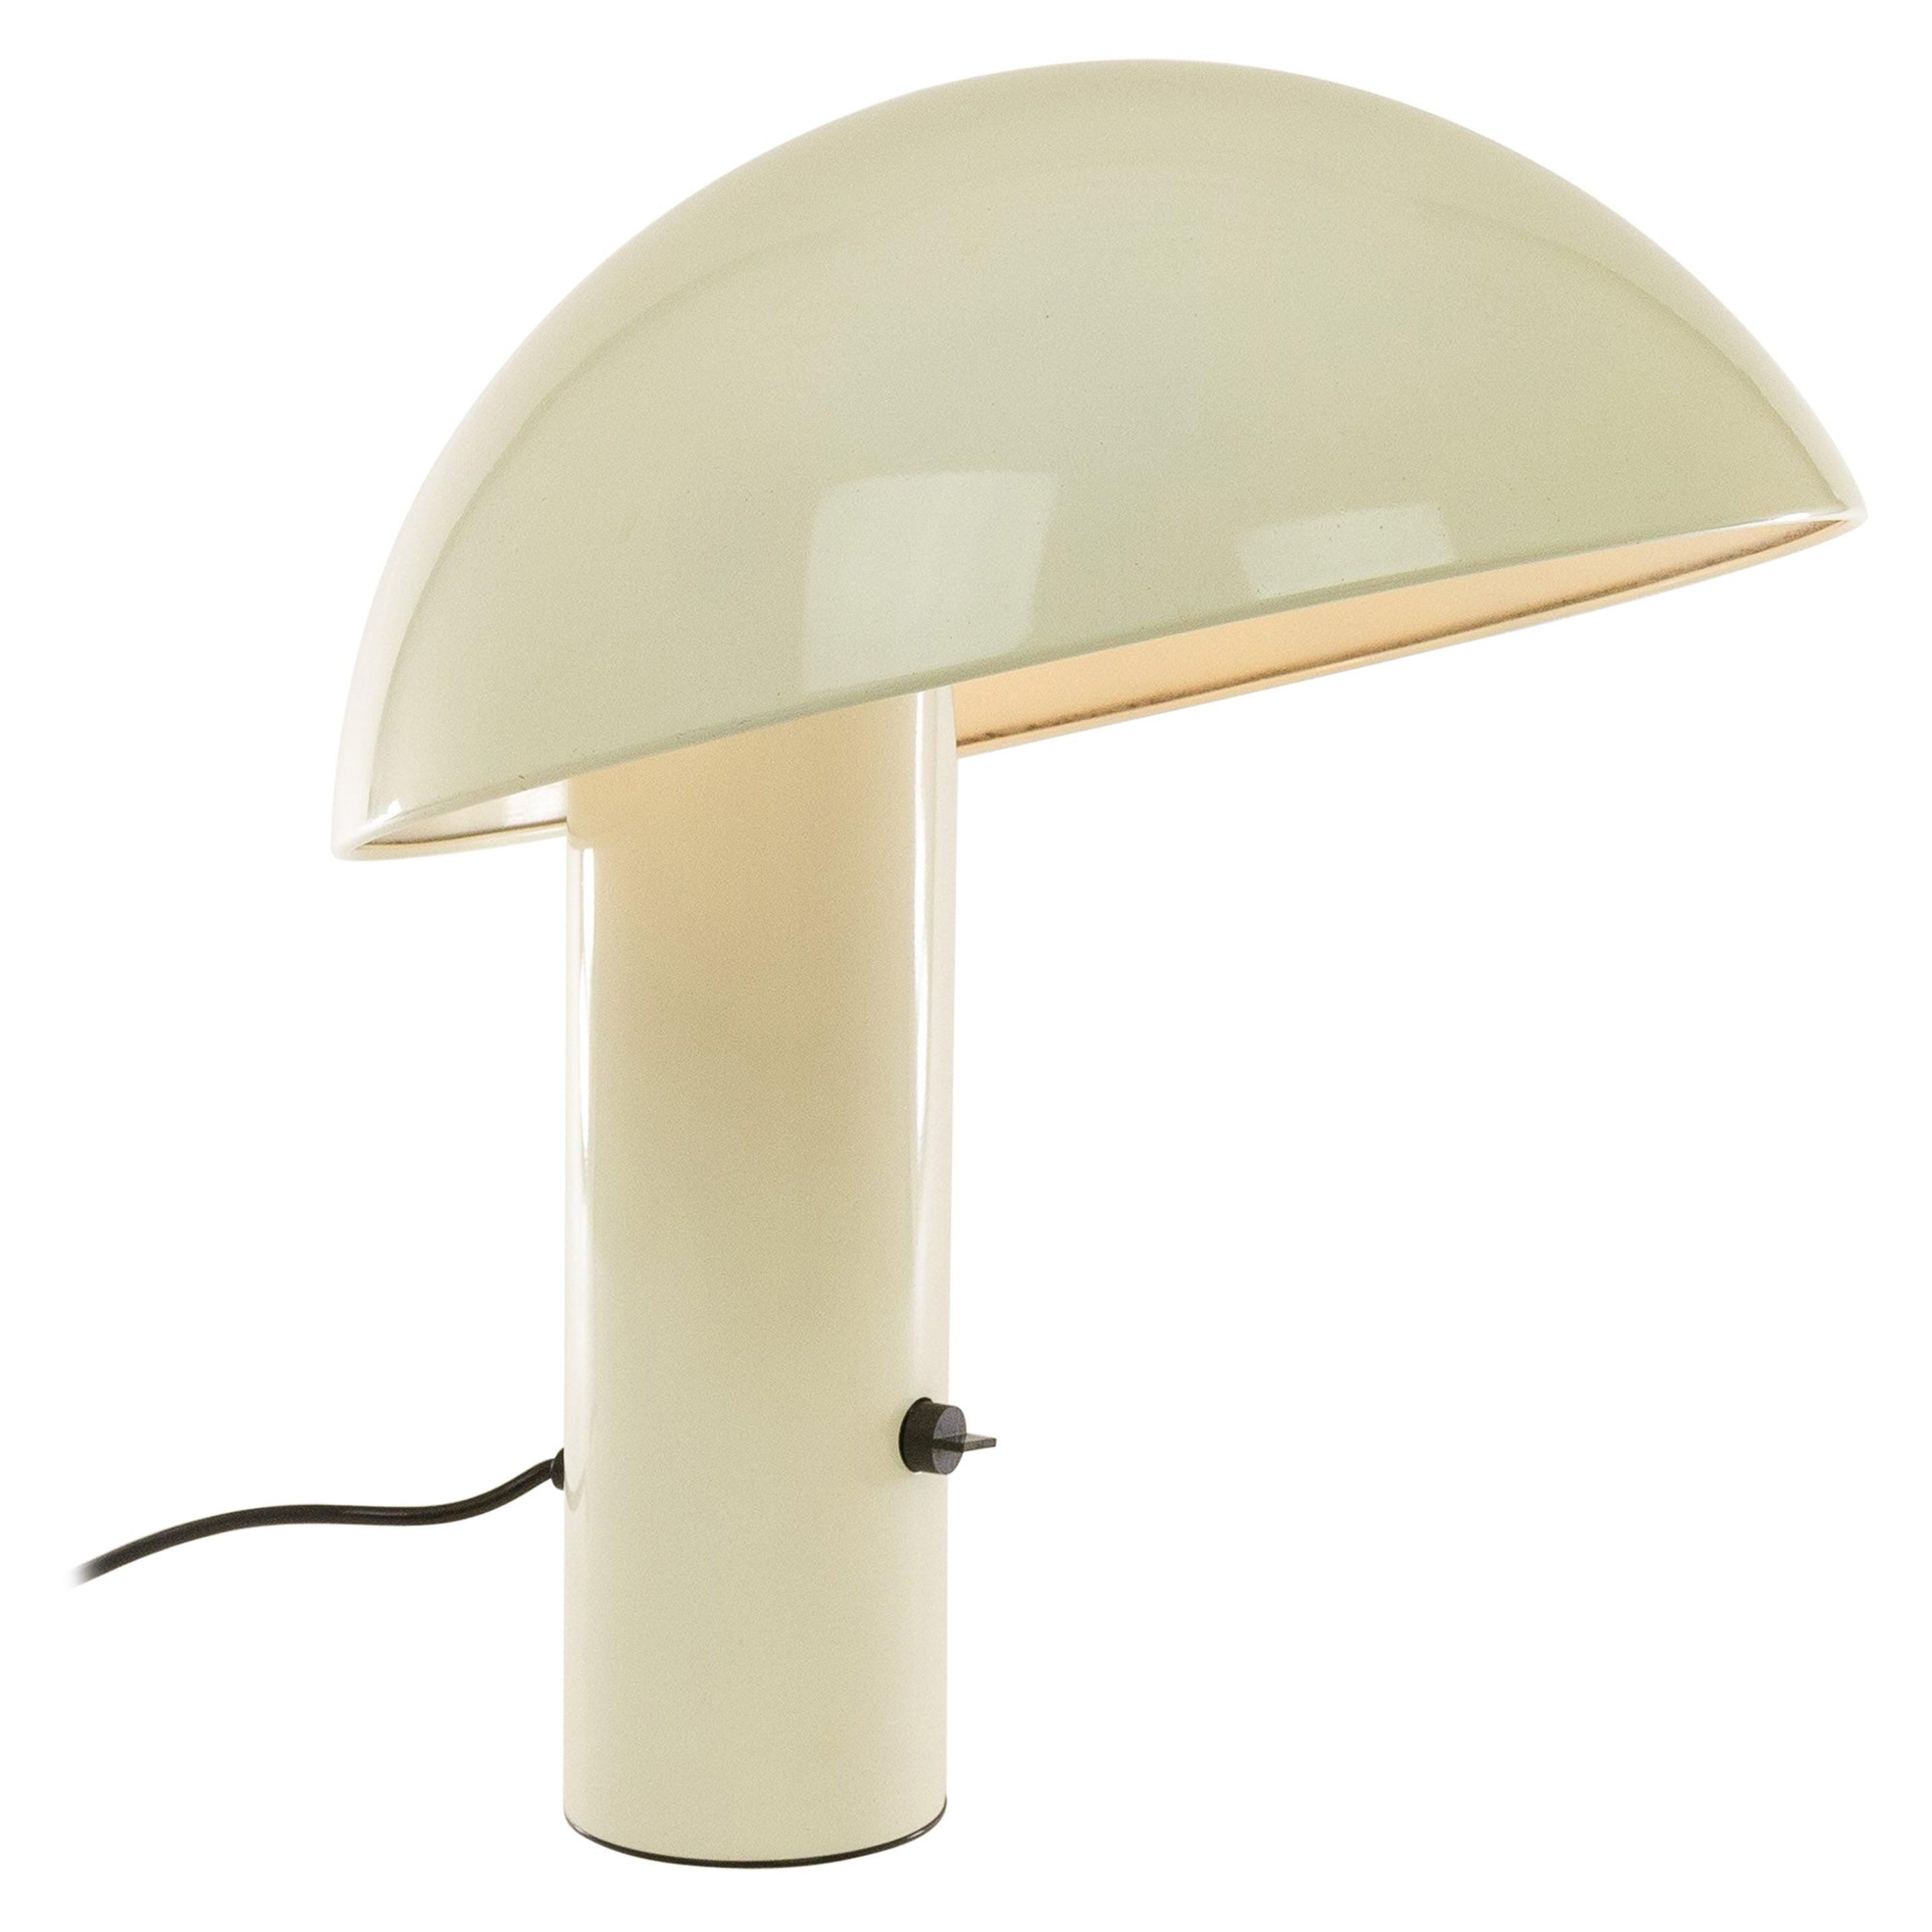 White Vaga Table Lamp by Franco Mirenzi for Valenti, 1970s